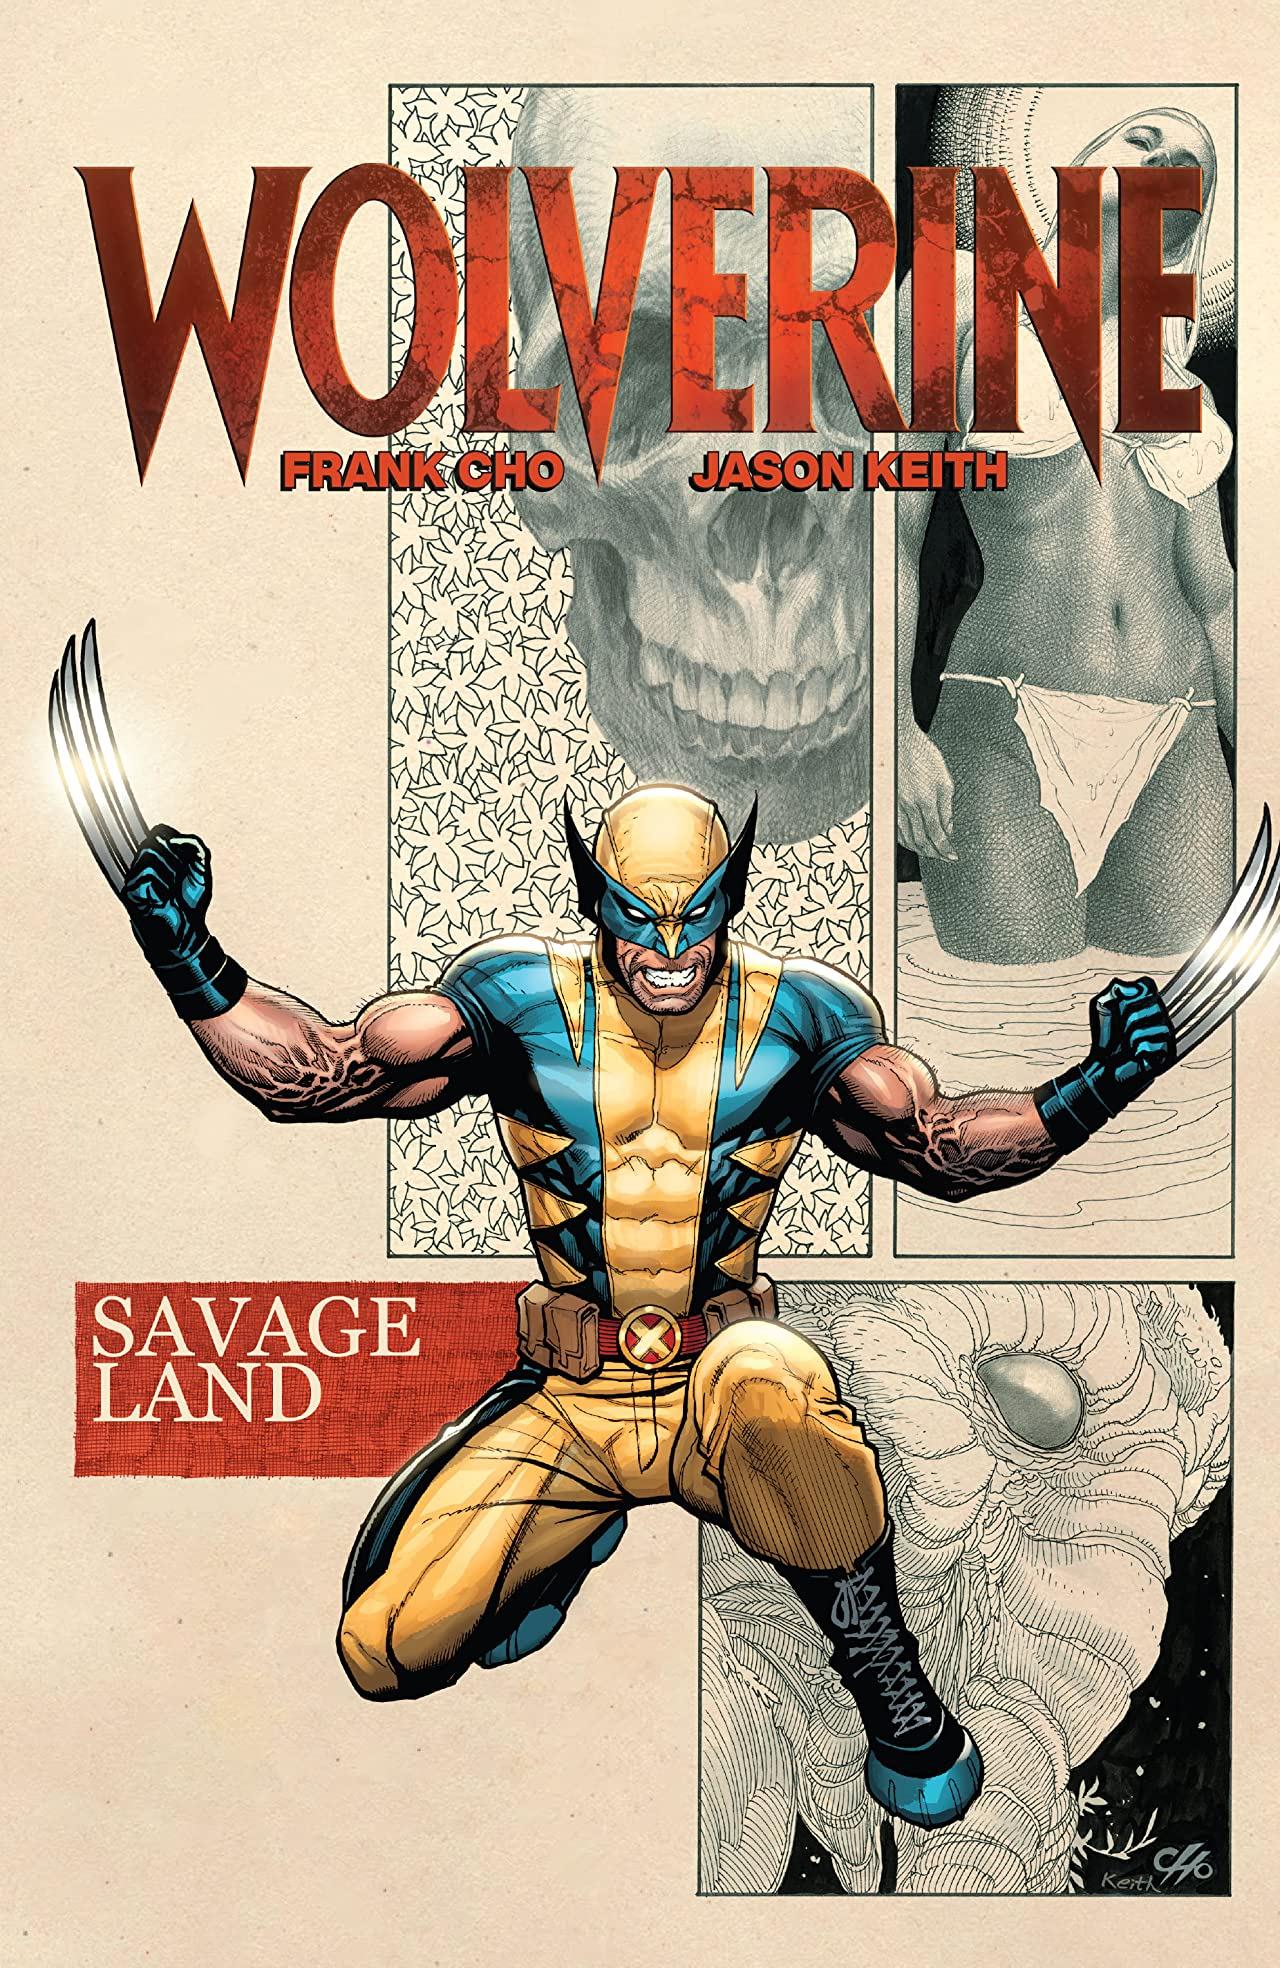 Wolverine by Frank Cho: Savage Land (Trade Paperback)